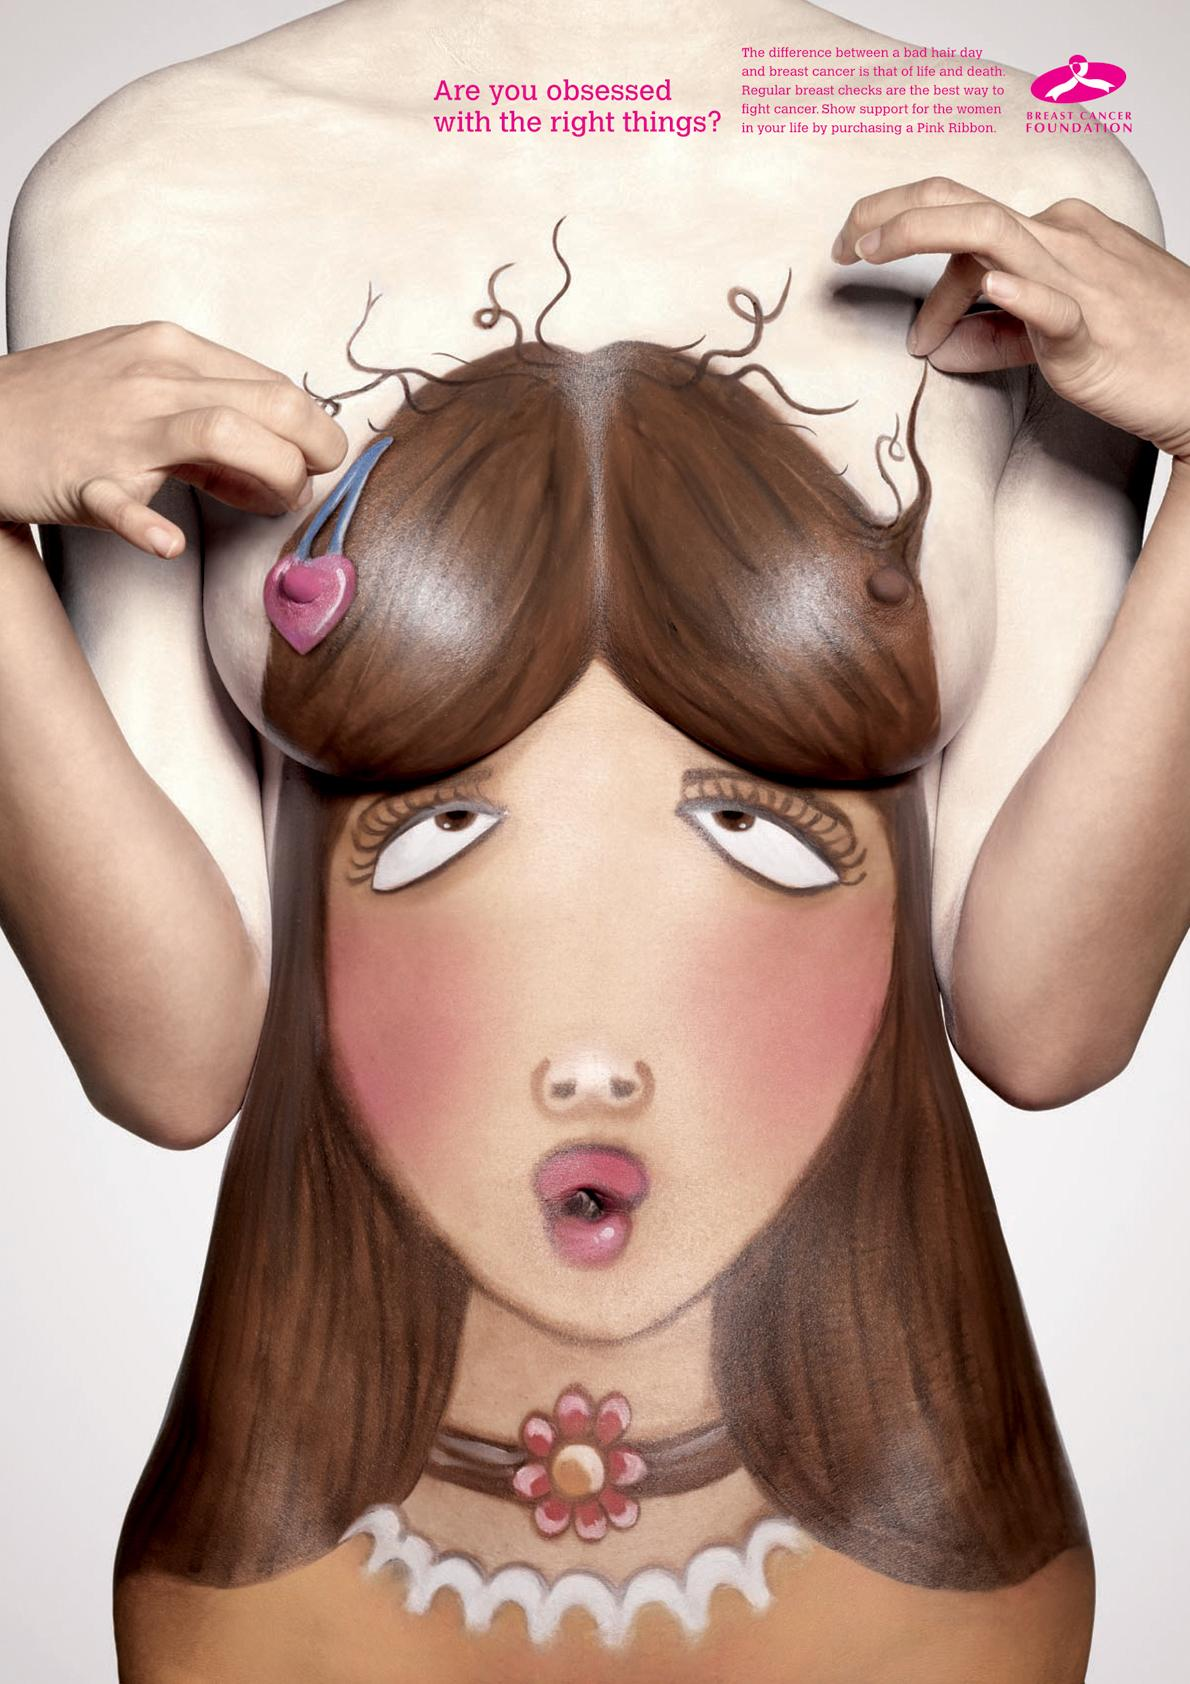 Breast Cancer Foundation Print Ad -  Bad hair day